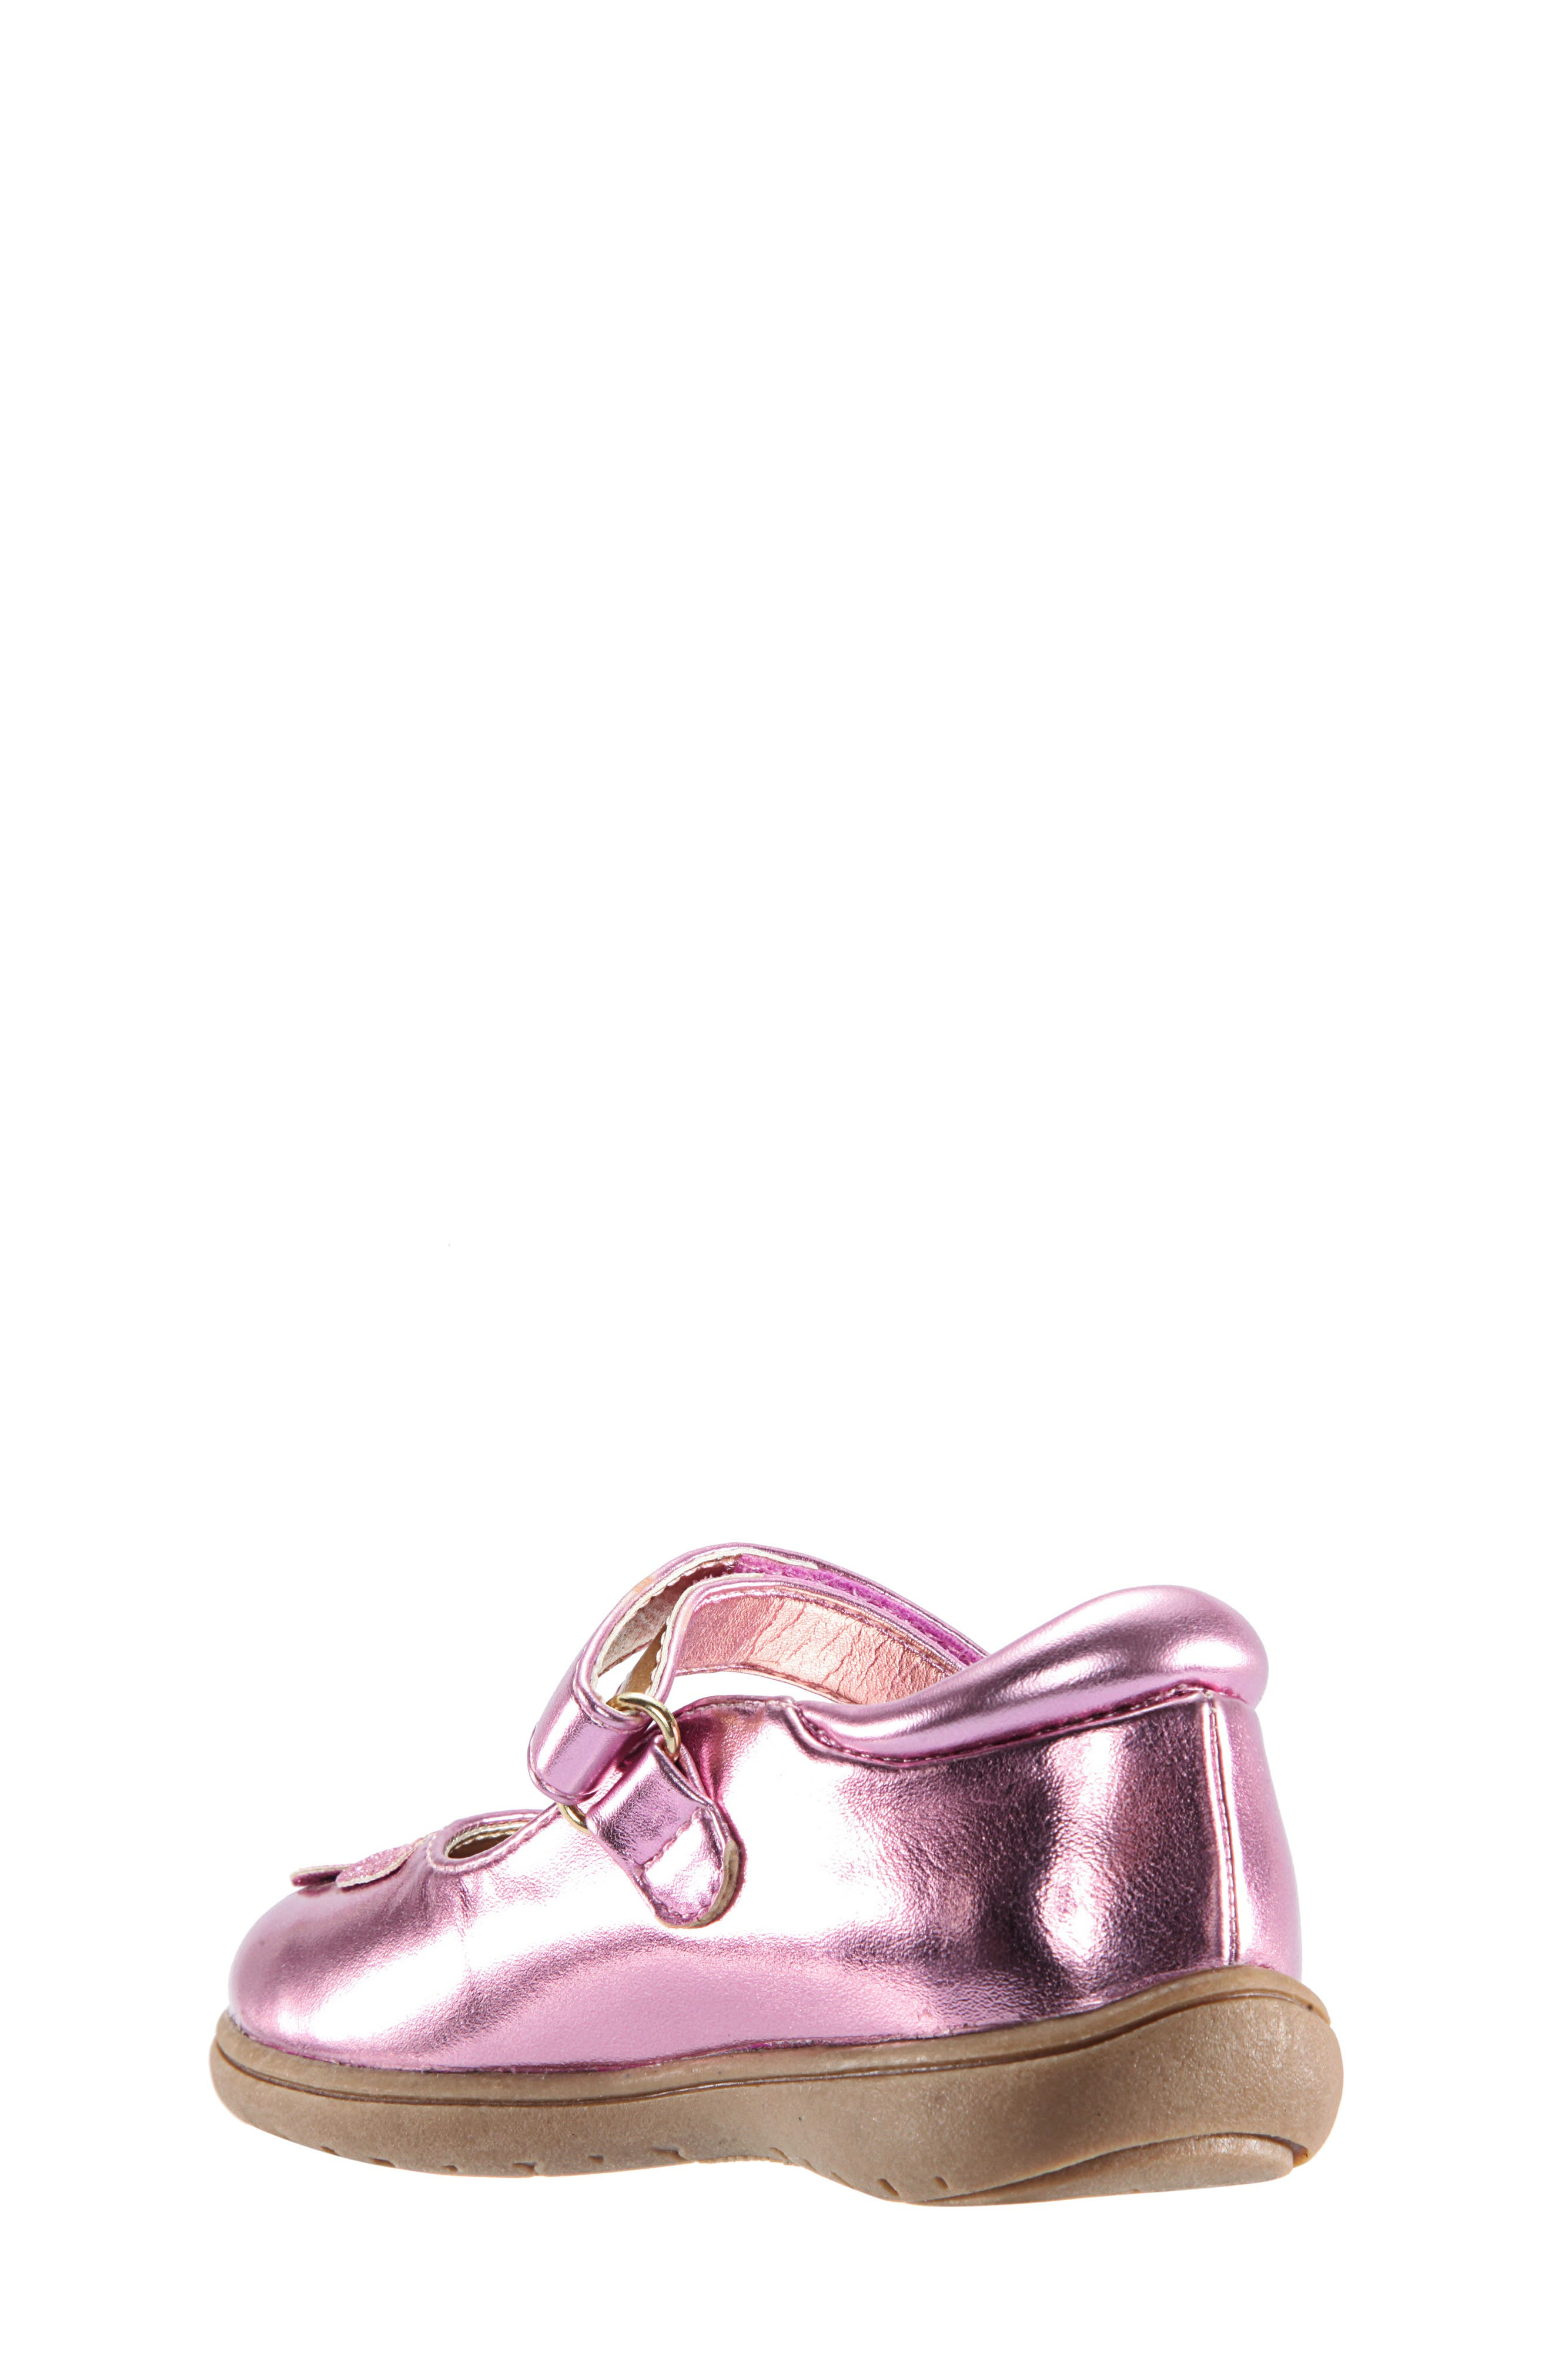 Alysha Glitter Mary Jane,                             Alternate thumbnail 2, color,                             PINK/ SMOOTH GLITTER